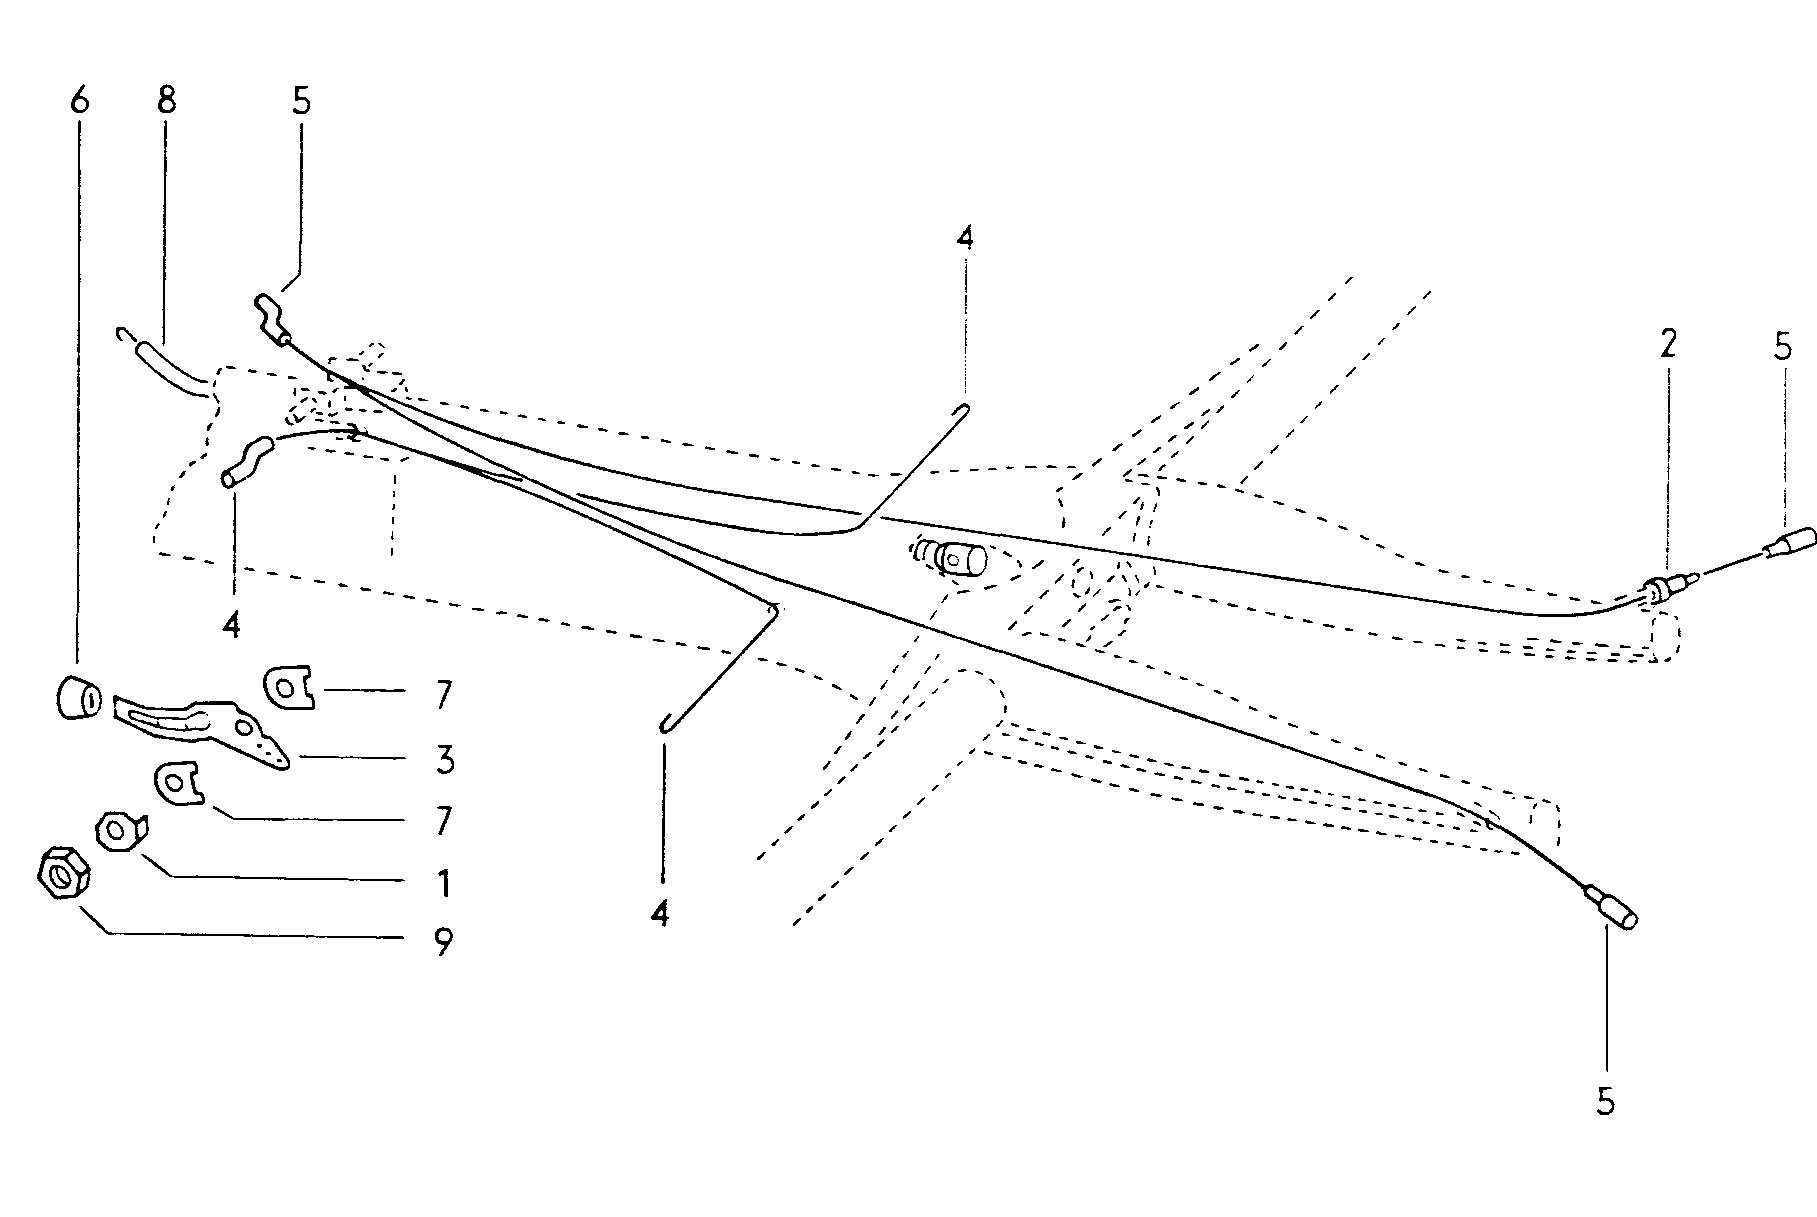 corrado vr6 wiring diagram cool venn 1992 volkswagen golf 1